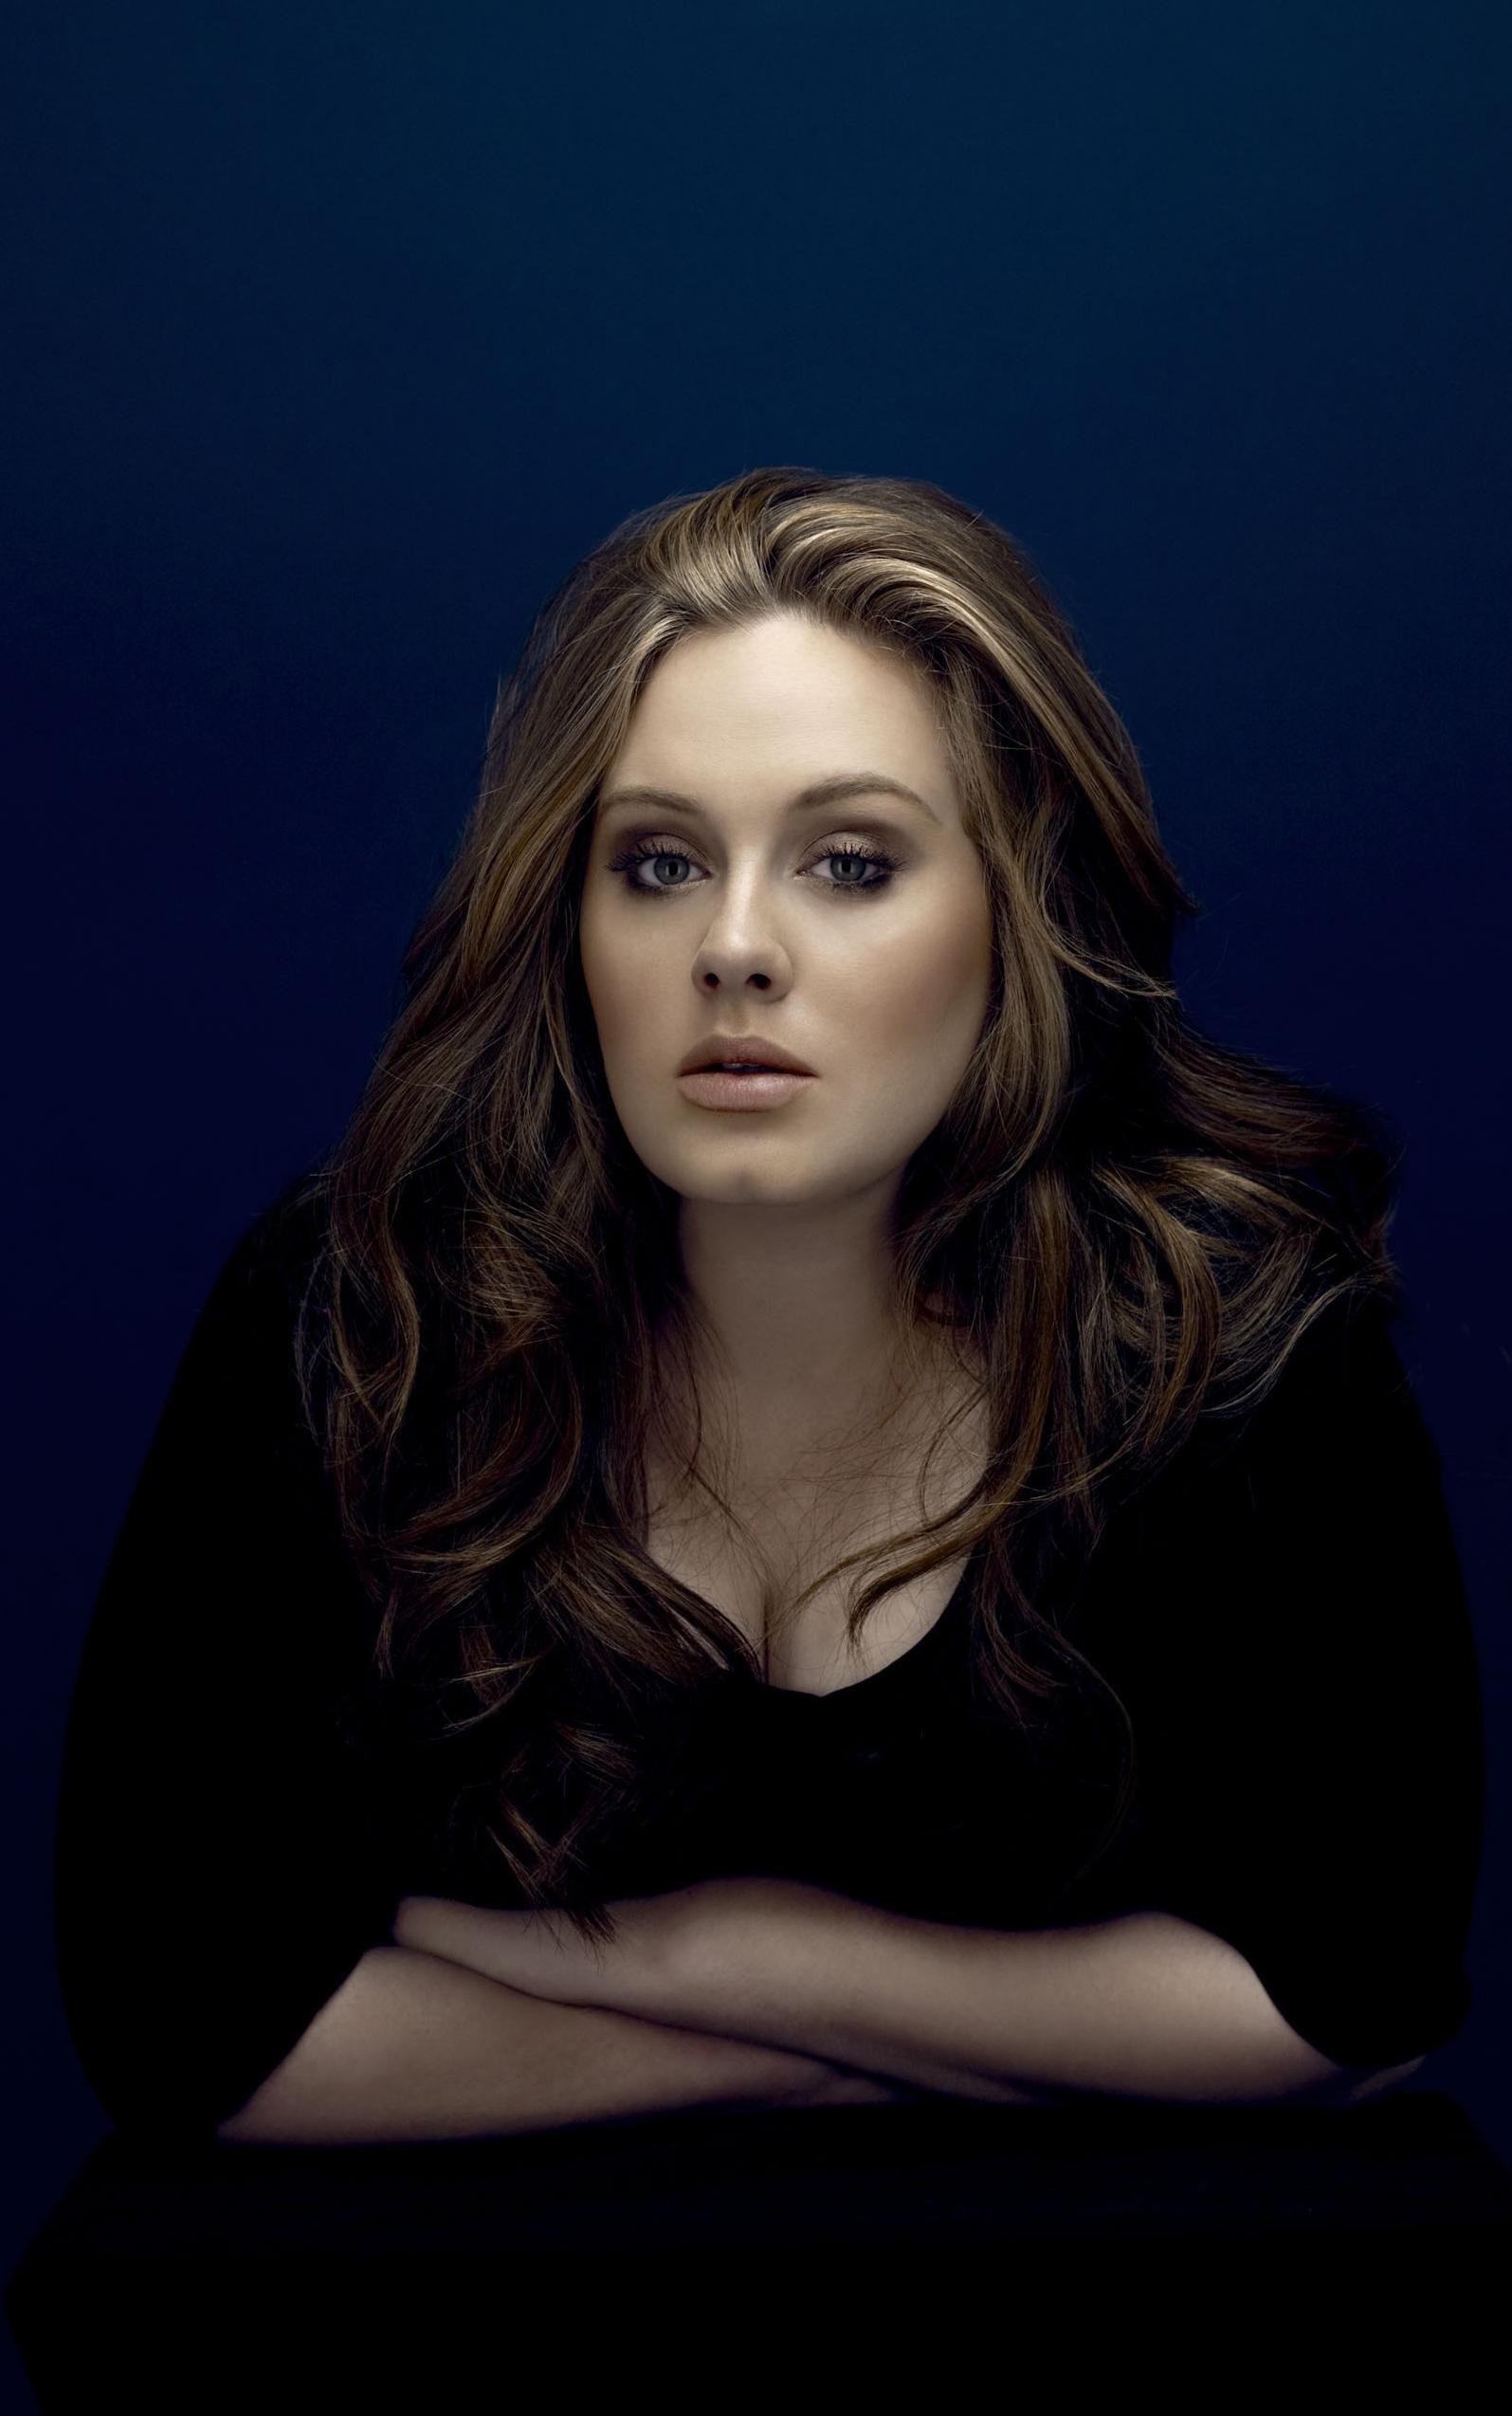 Foto de Adele  número 34532